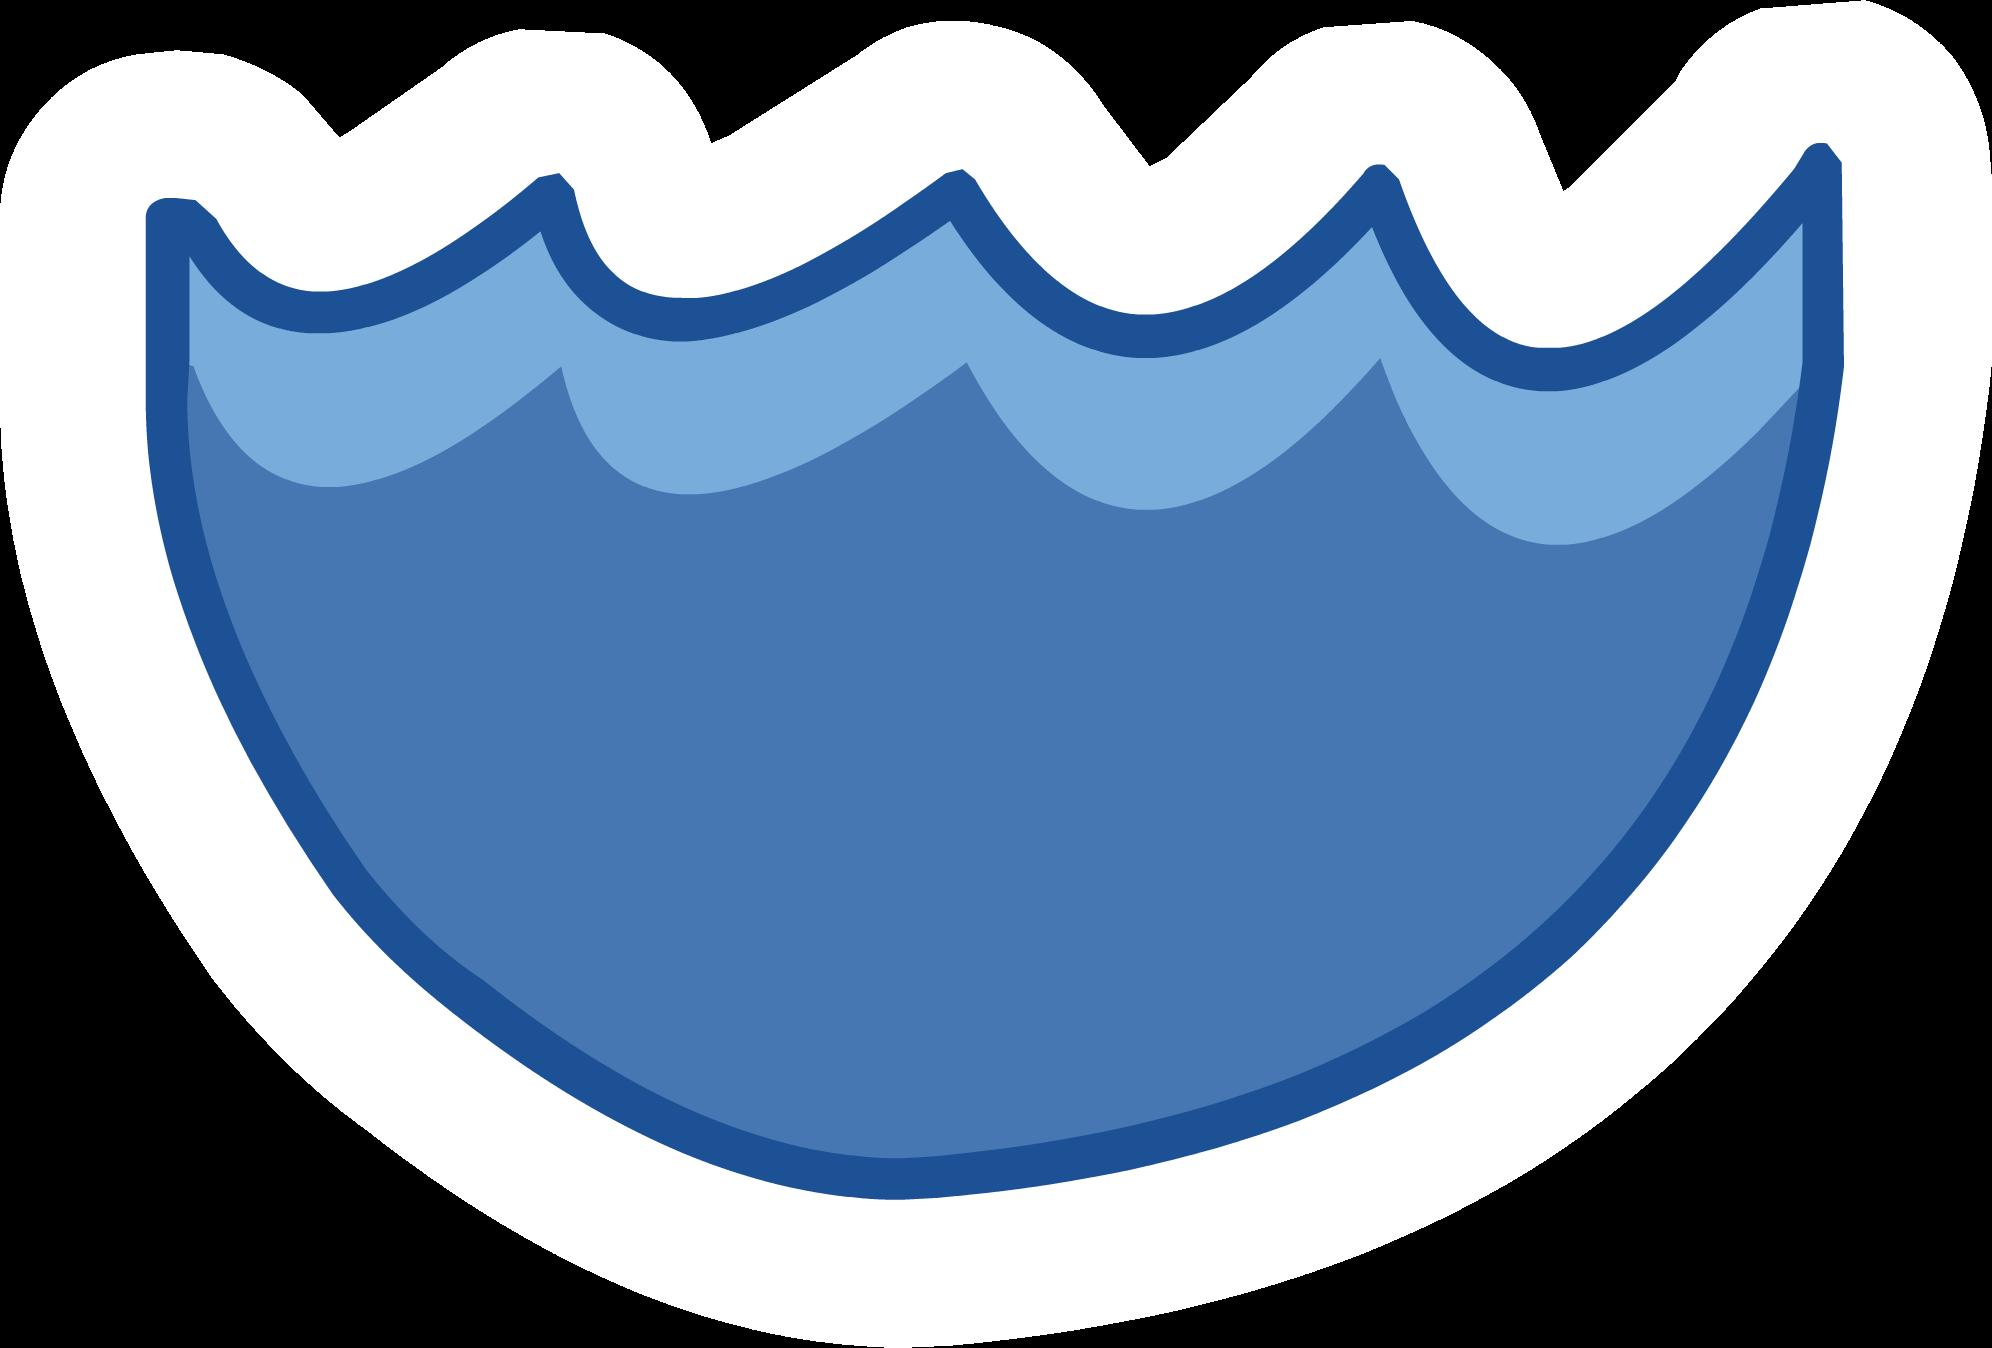 Iceberg clipart ice lake. Club penguin water symbol